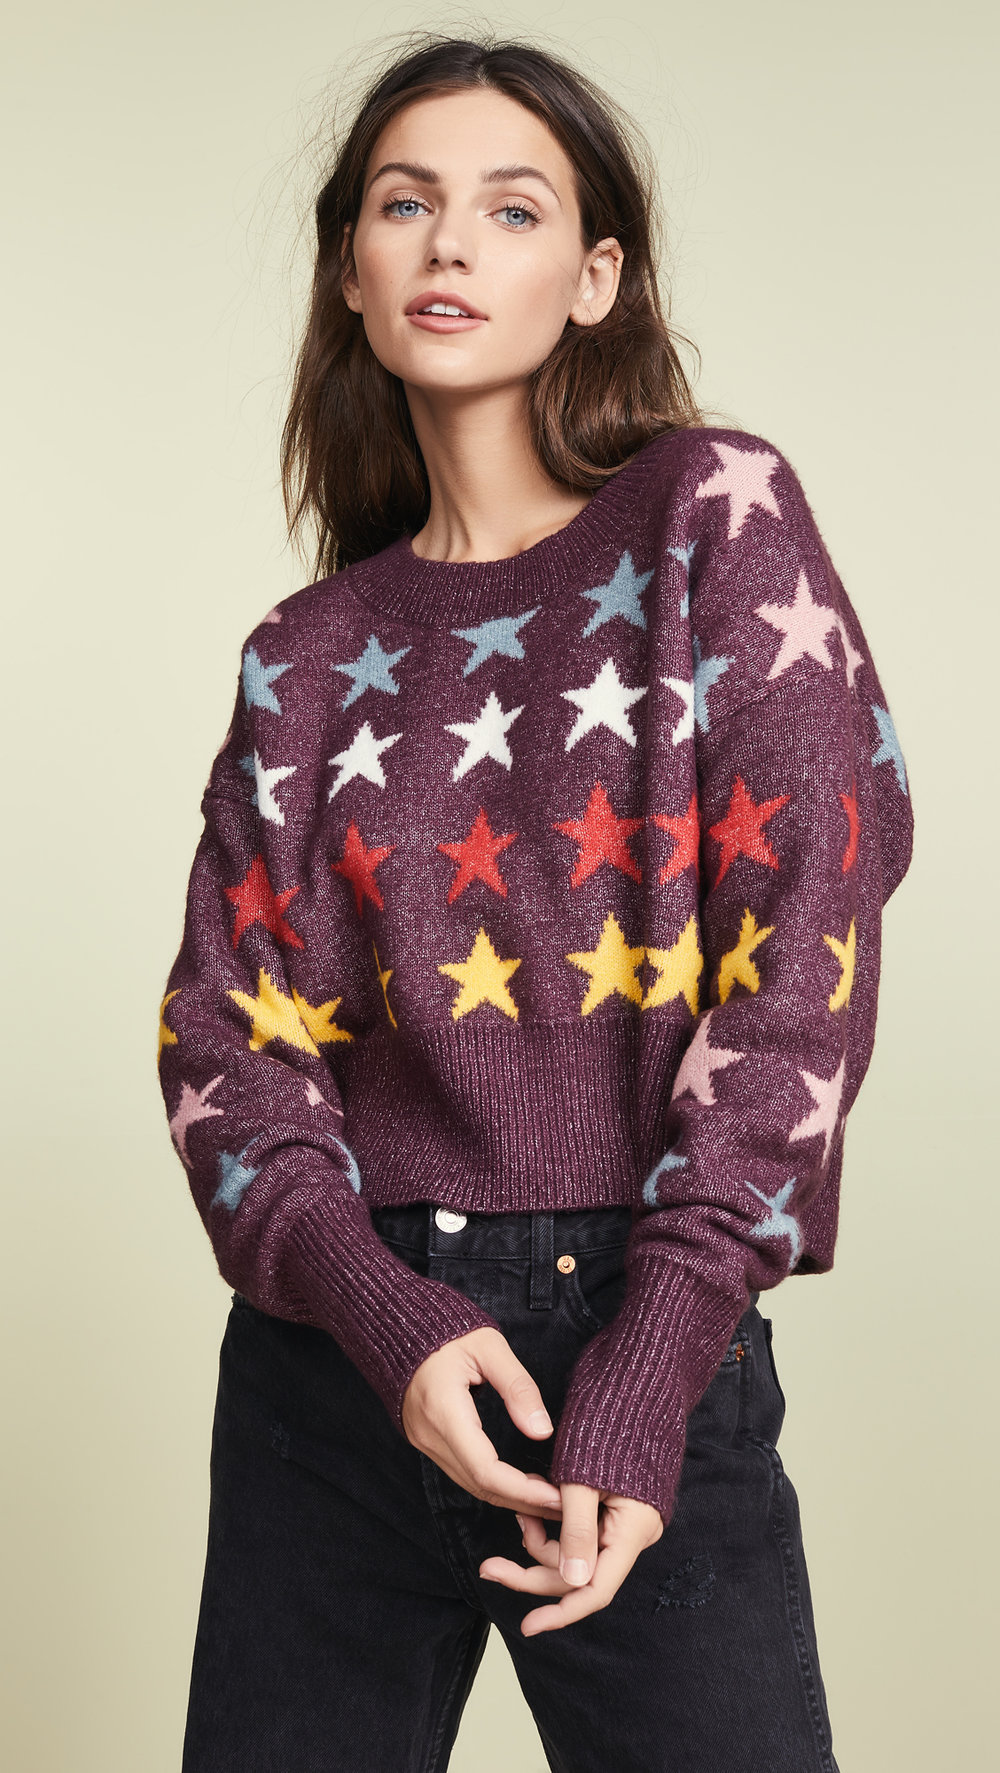 WildfoxRainbow star sweater - Was: $208.00Now $104.00